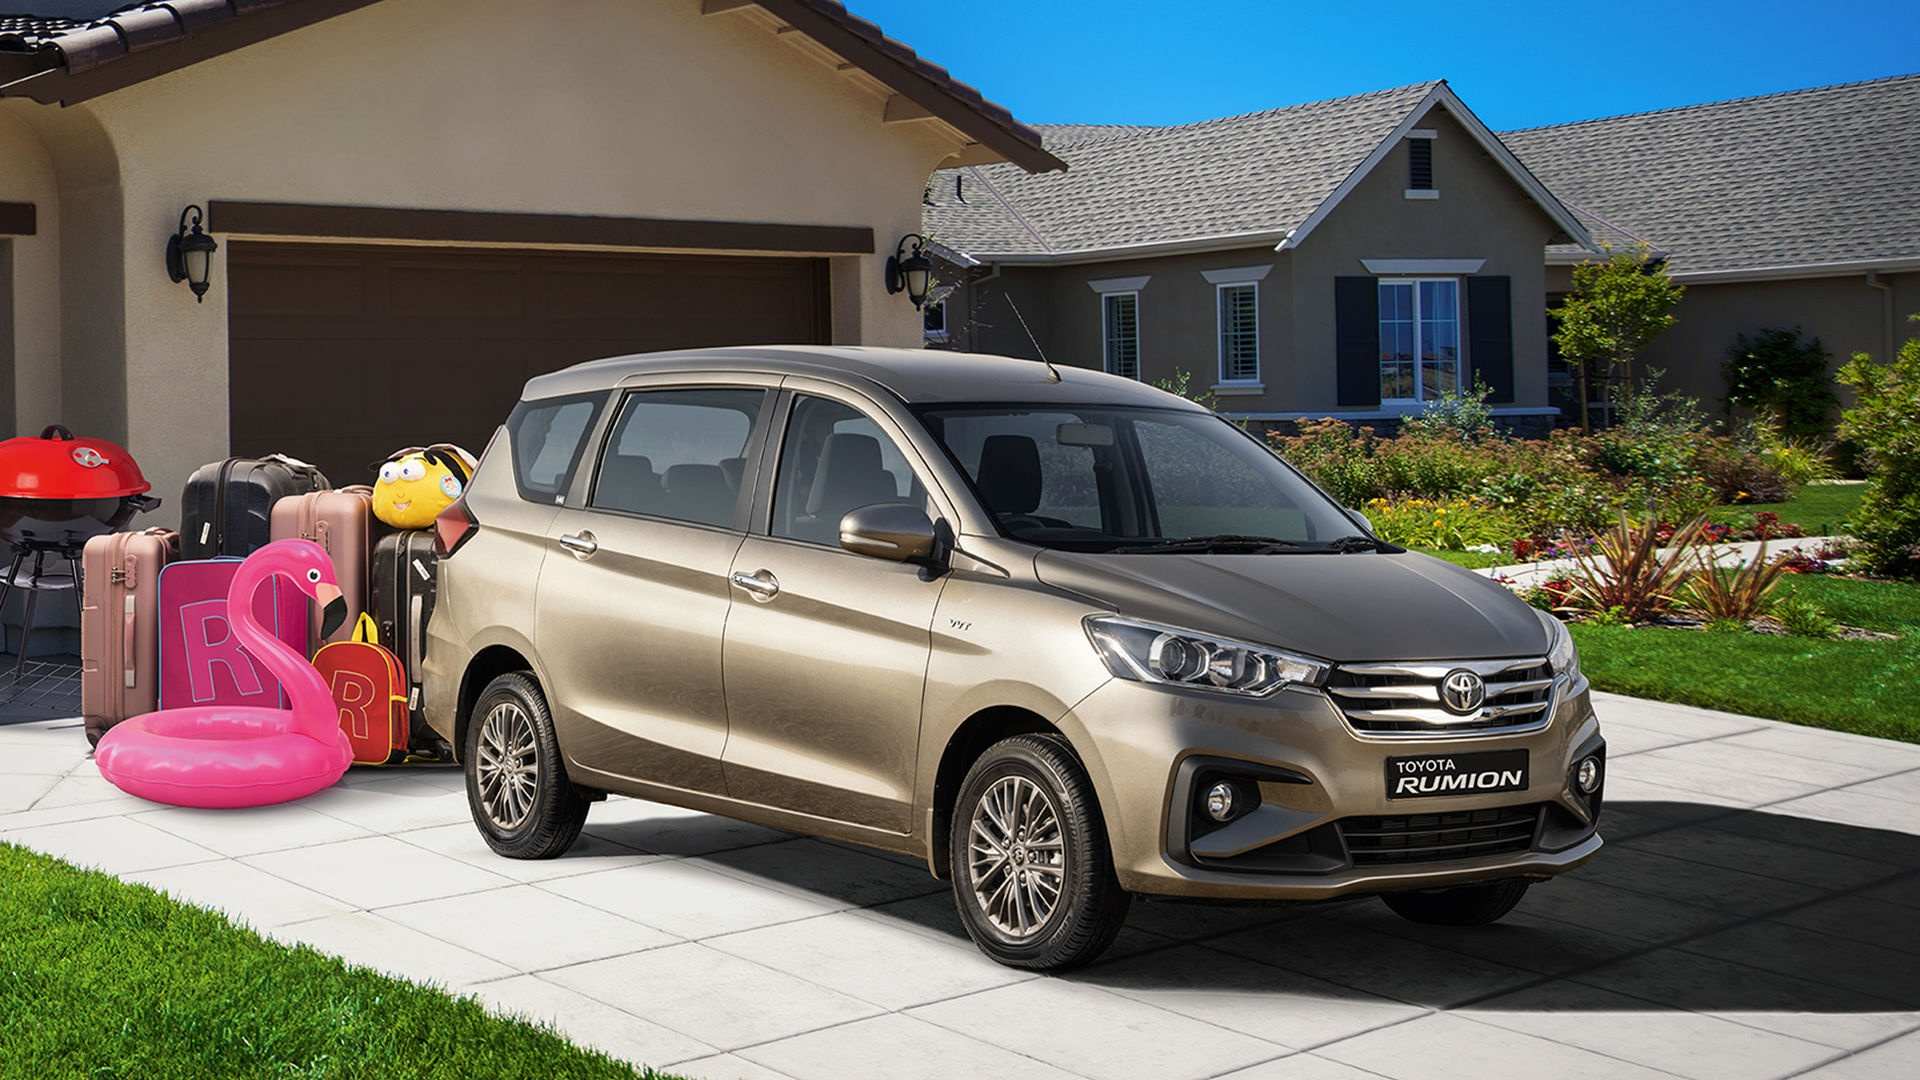 Toyota gắn logo lên Suzuki Ertiga, có giúp cả hai đổi vận? - ảnh 10